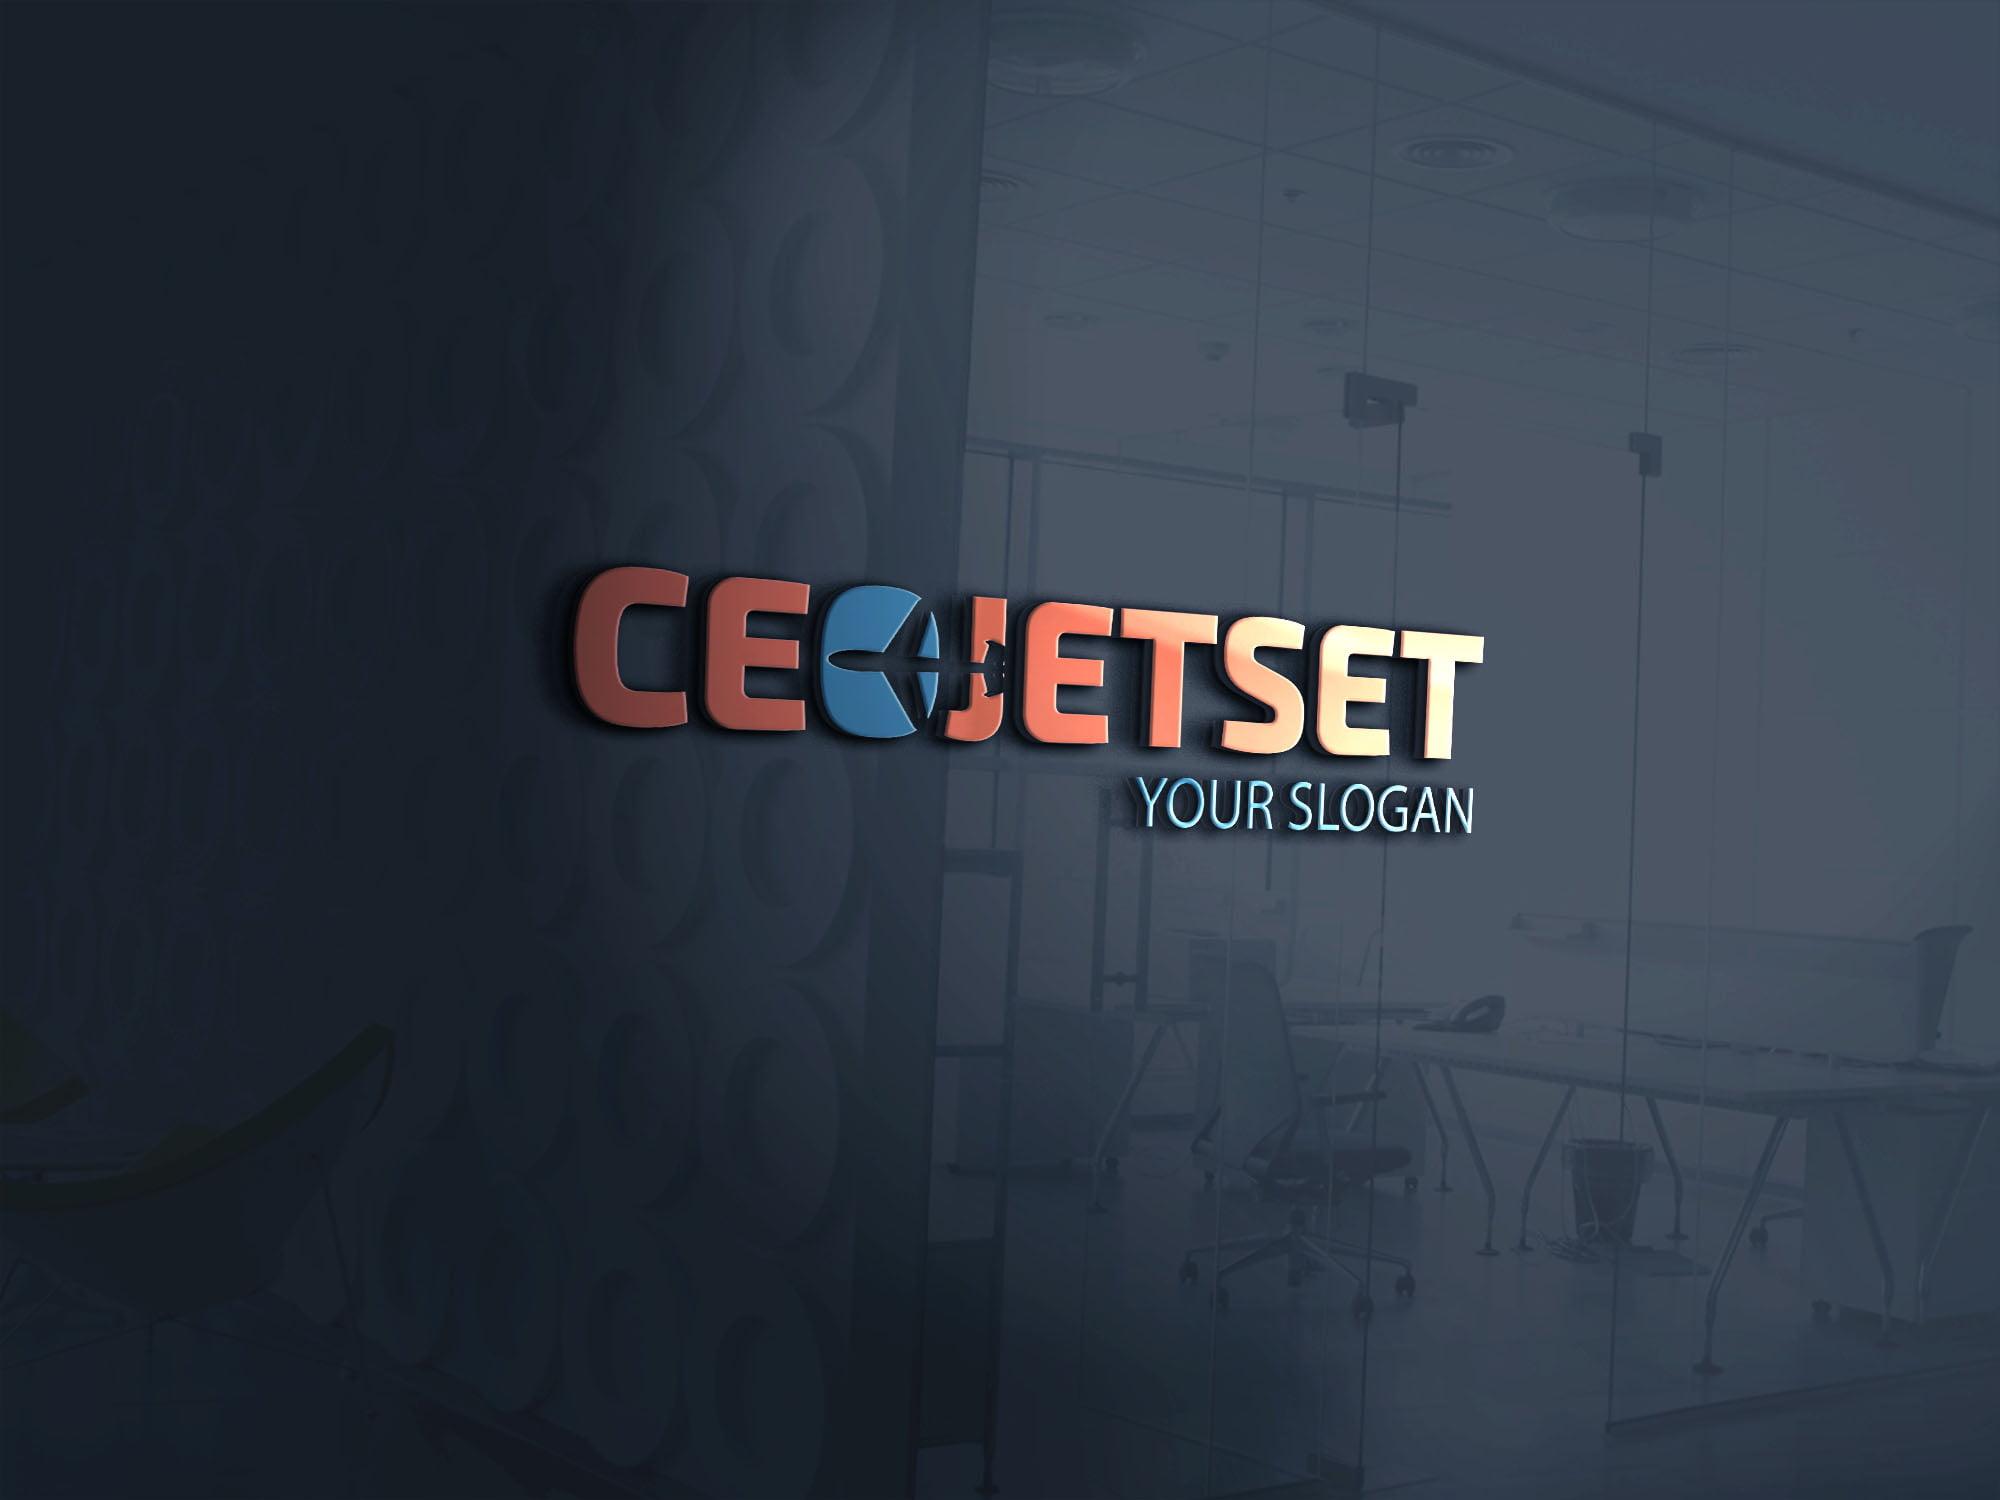 CEO jet set logo on 3d glass window